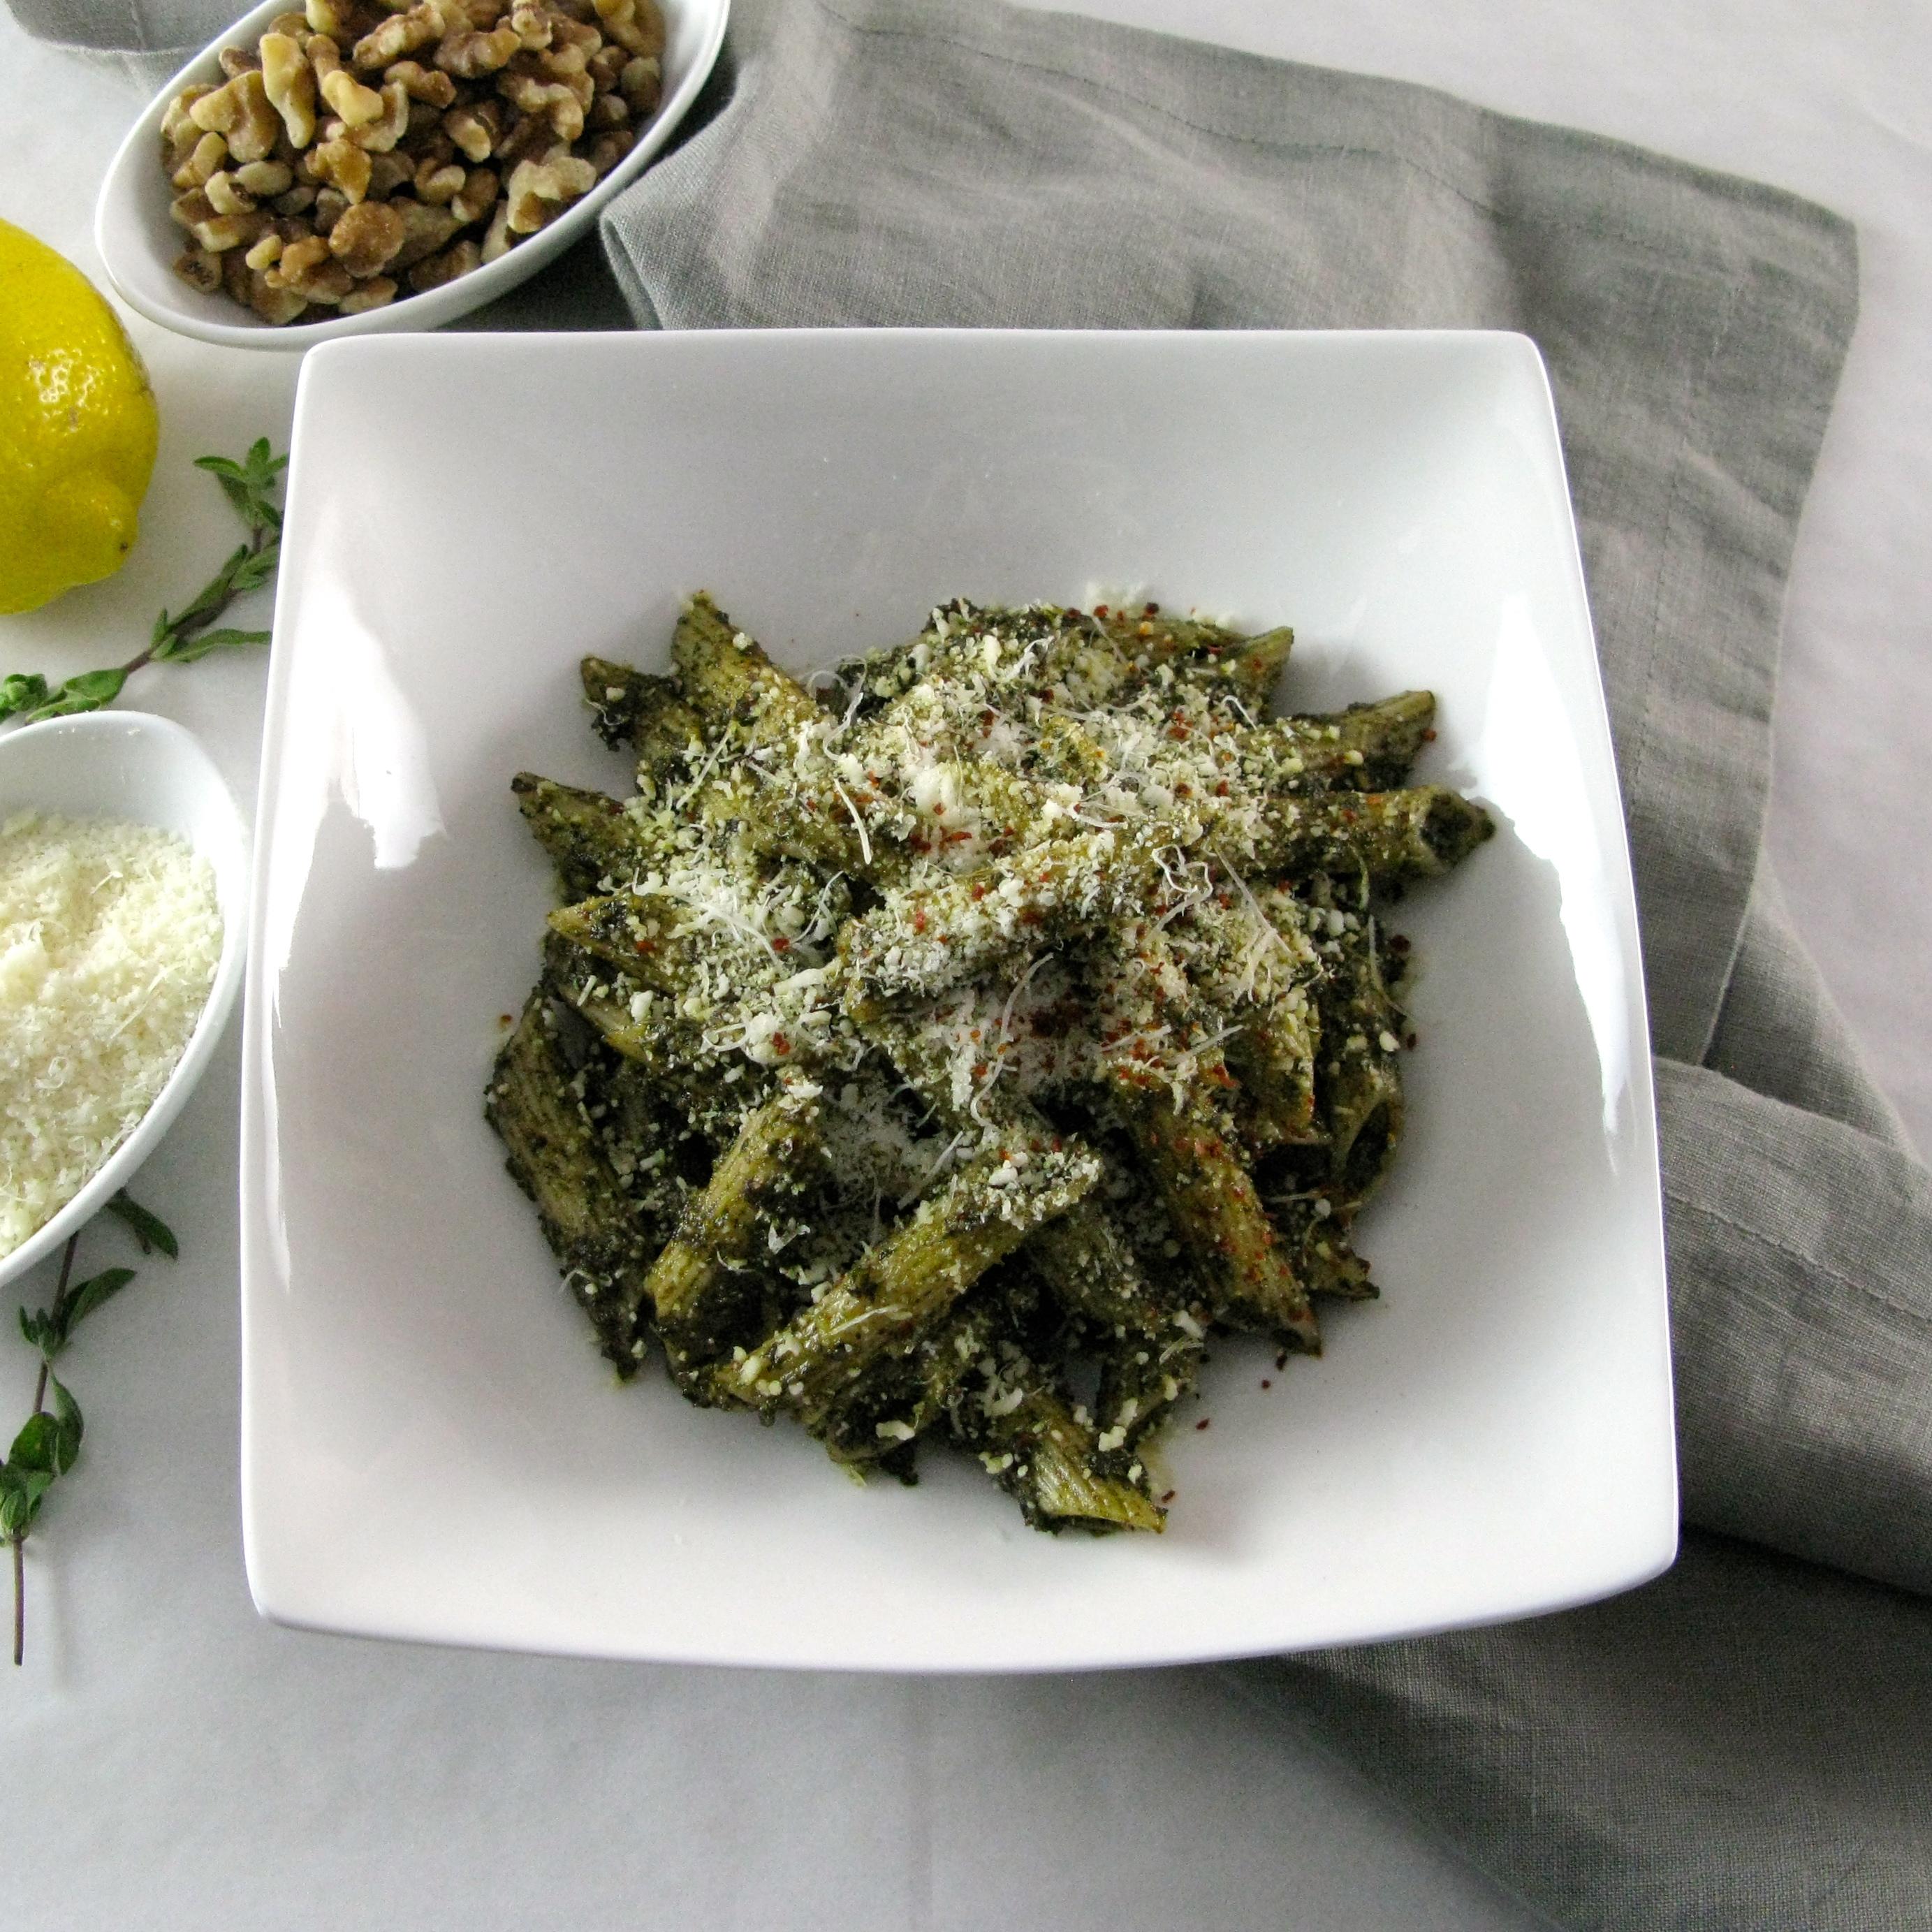 Penne with Lemony Kale and Pecorino Walnut Pesto